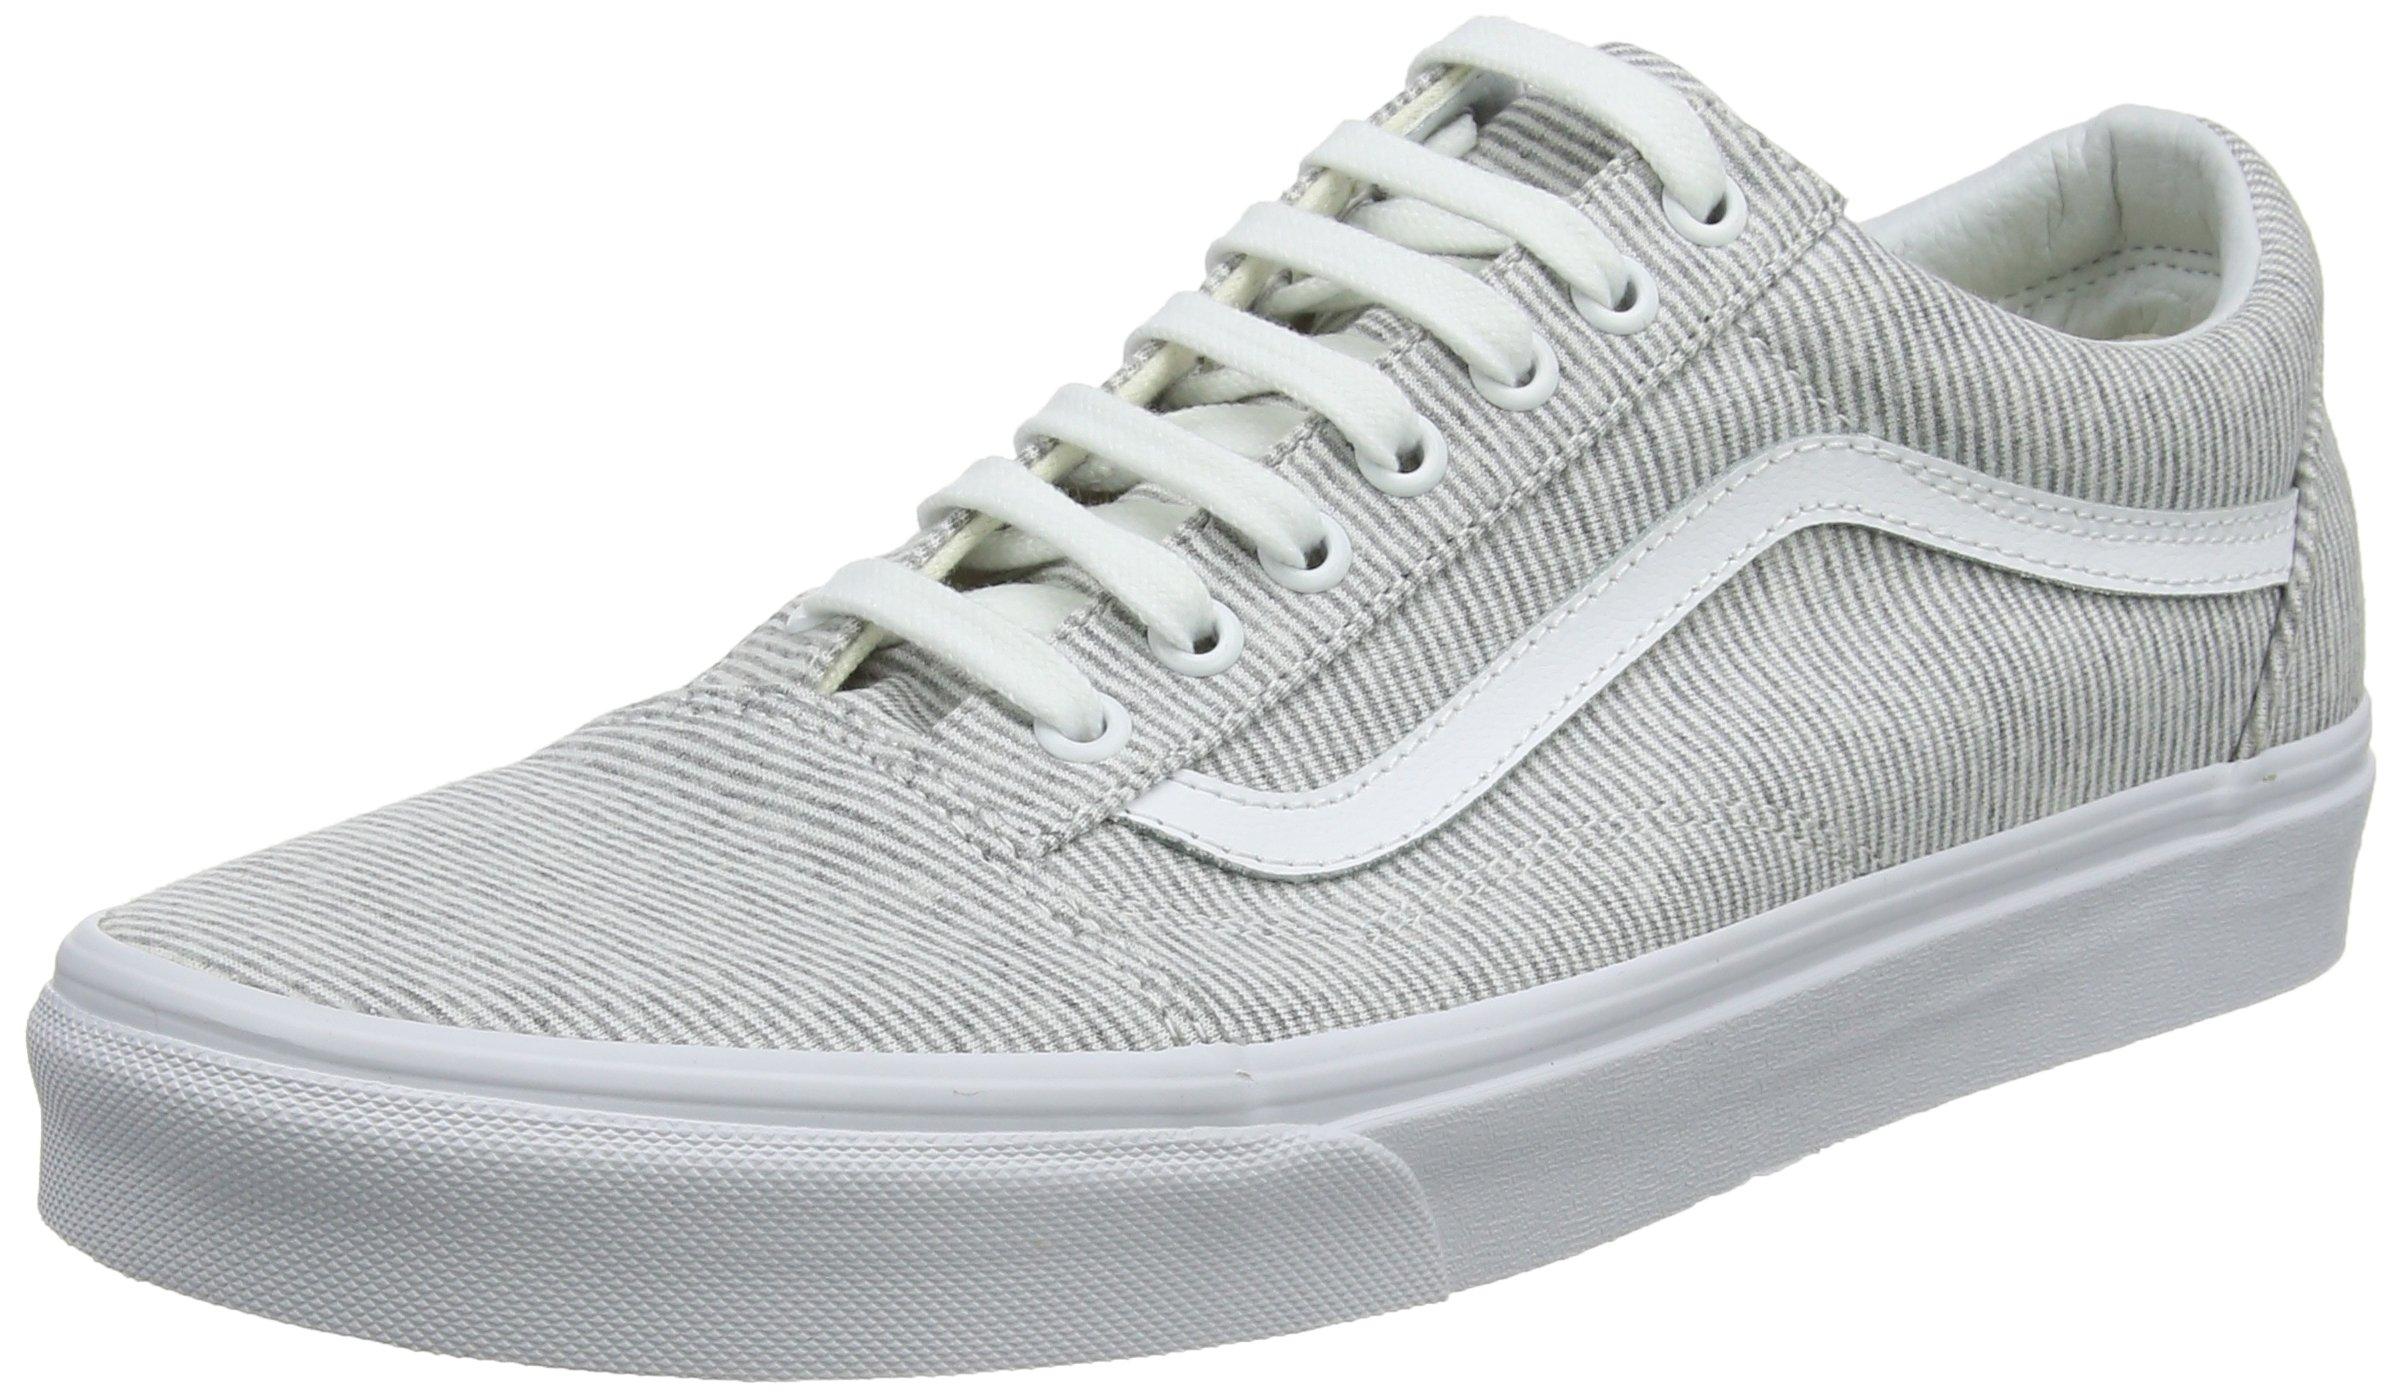 Vans Women's Old Skool Trainers, Grey ((Jersey) GrayTrue White I1f), 6 UK 39 EU